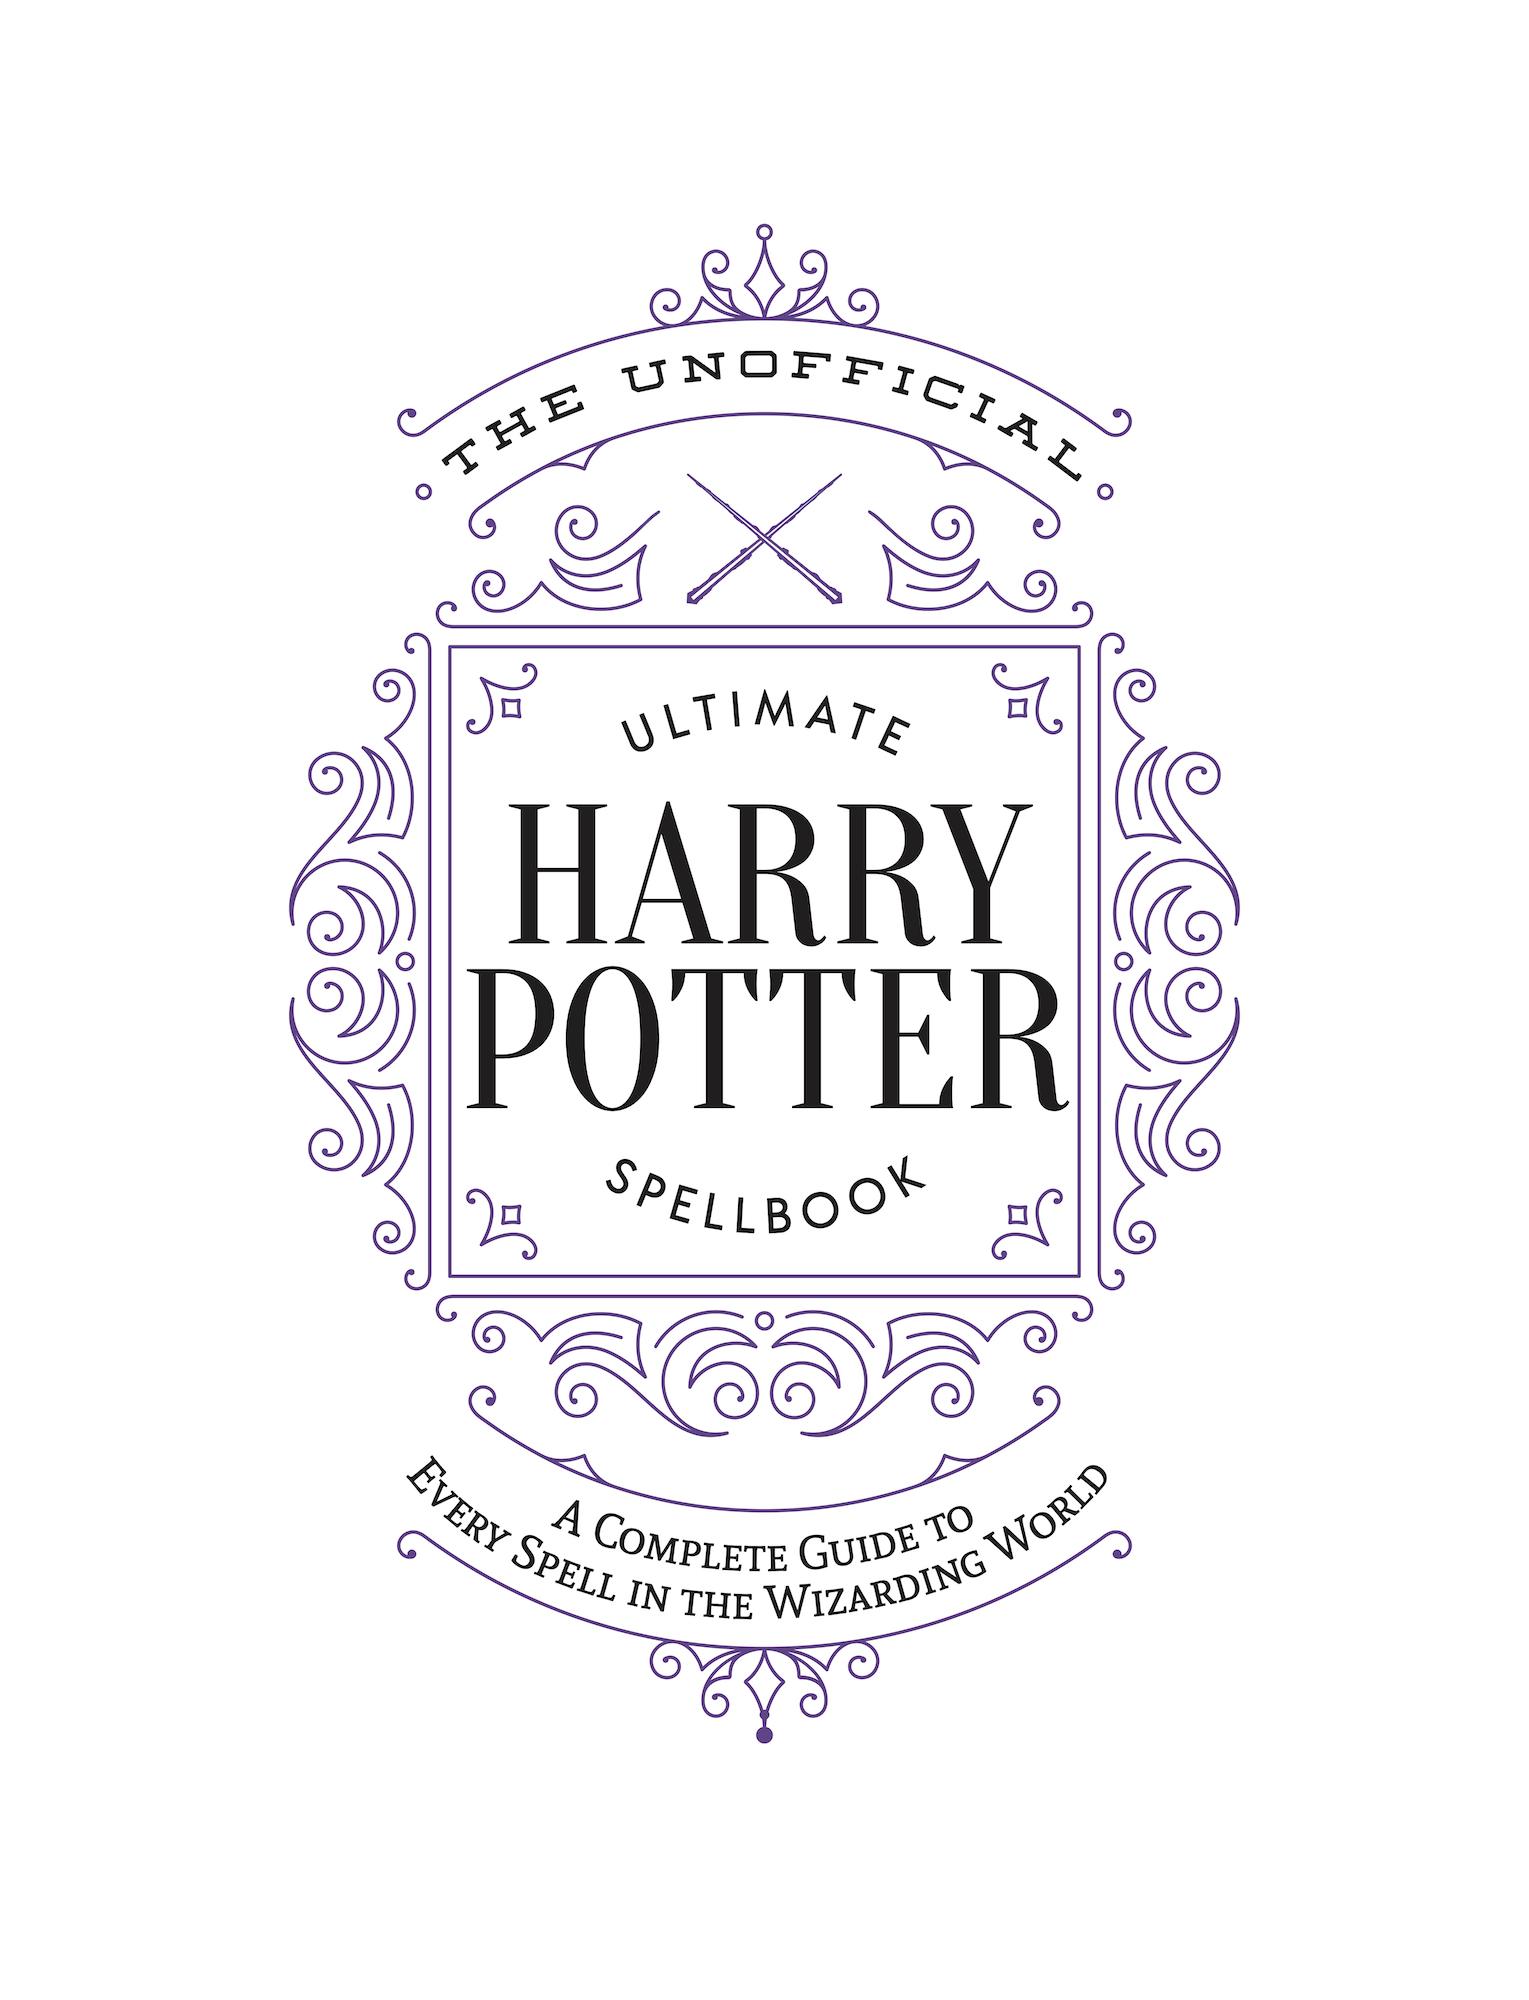 Unofficial Spellbook title